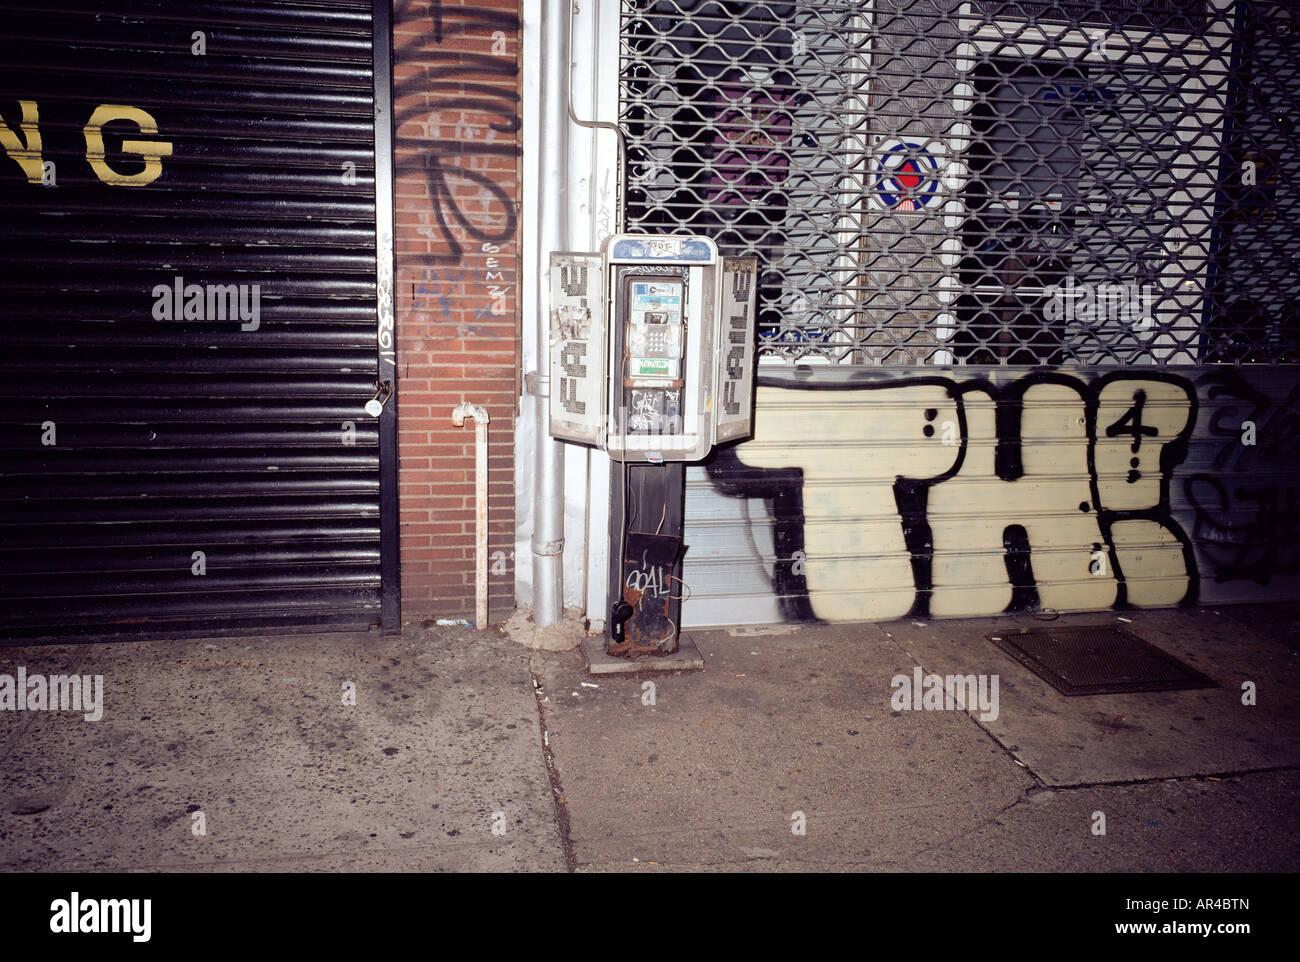 Graffiti and vandalised payphone - Stock Image